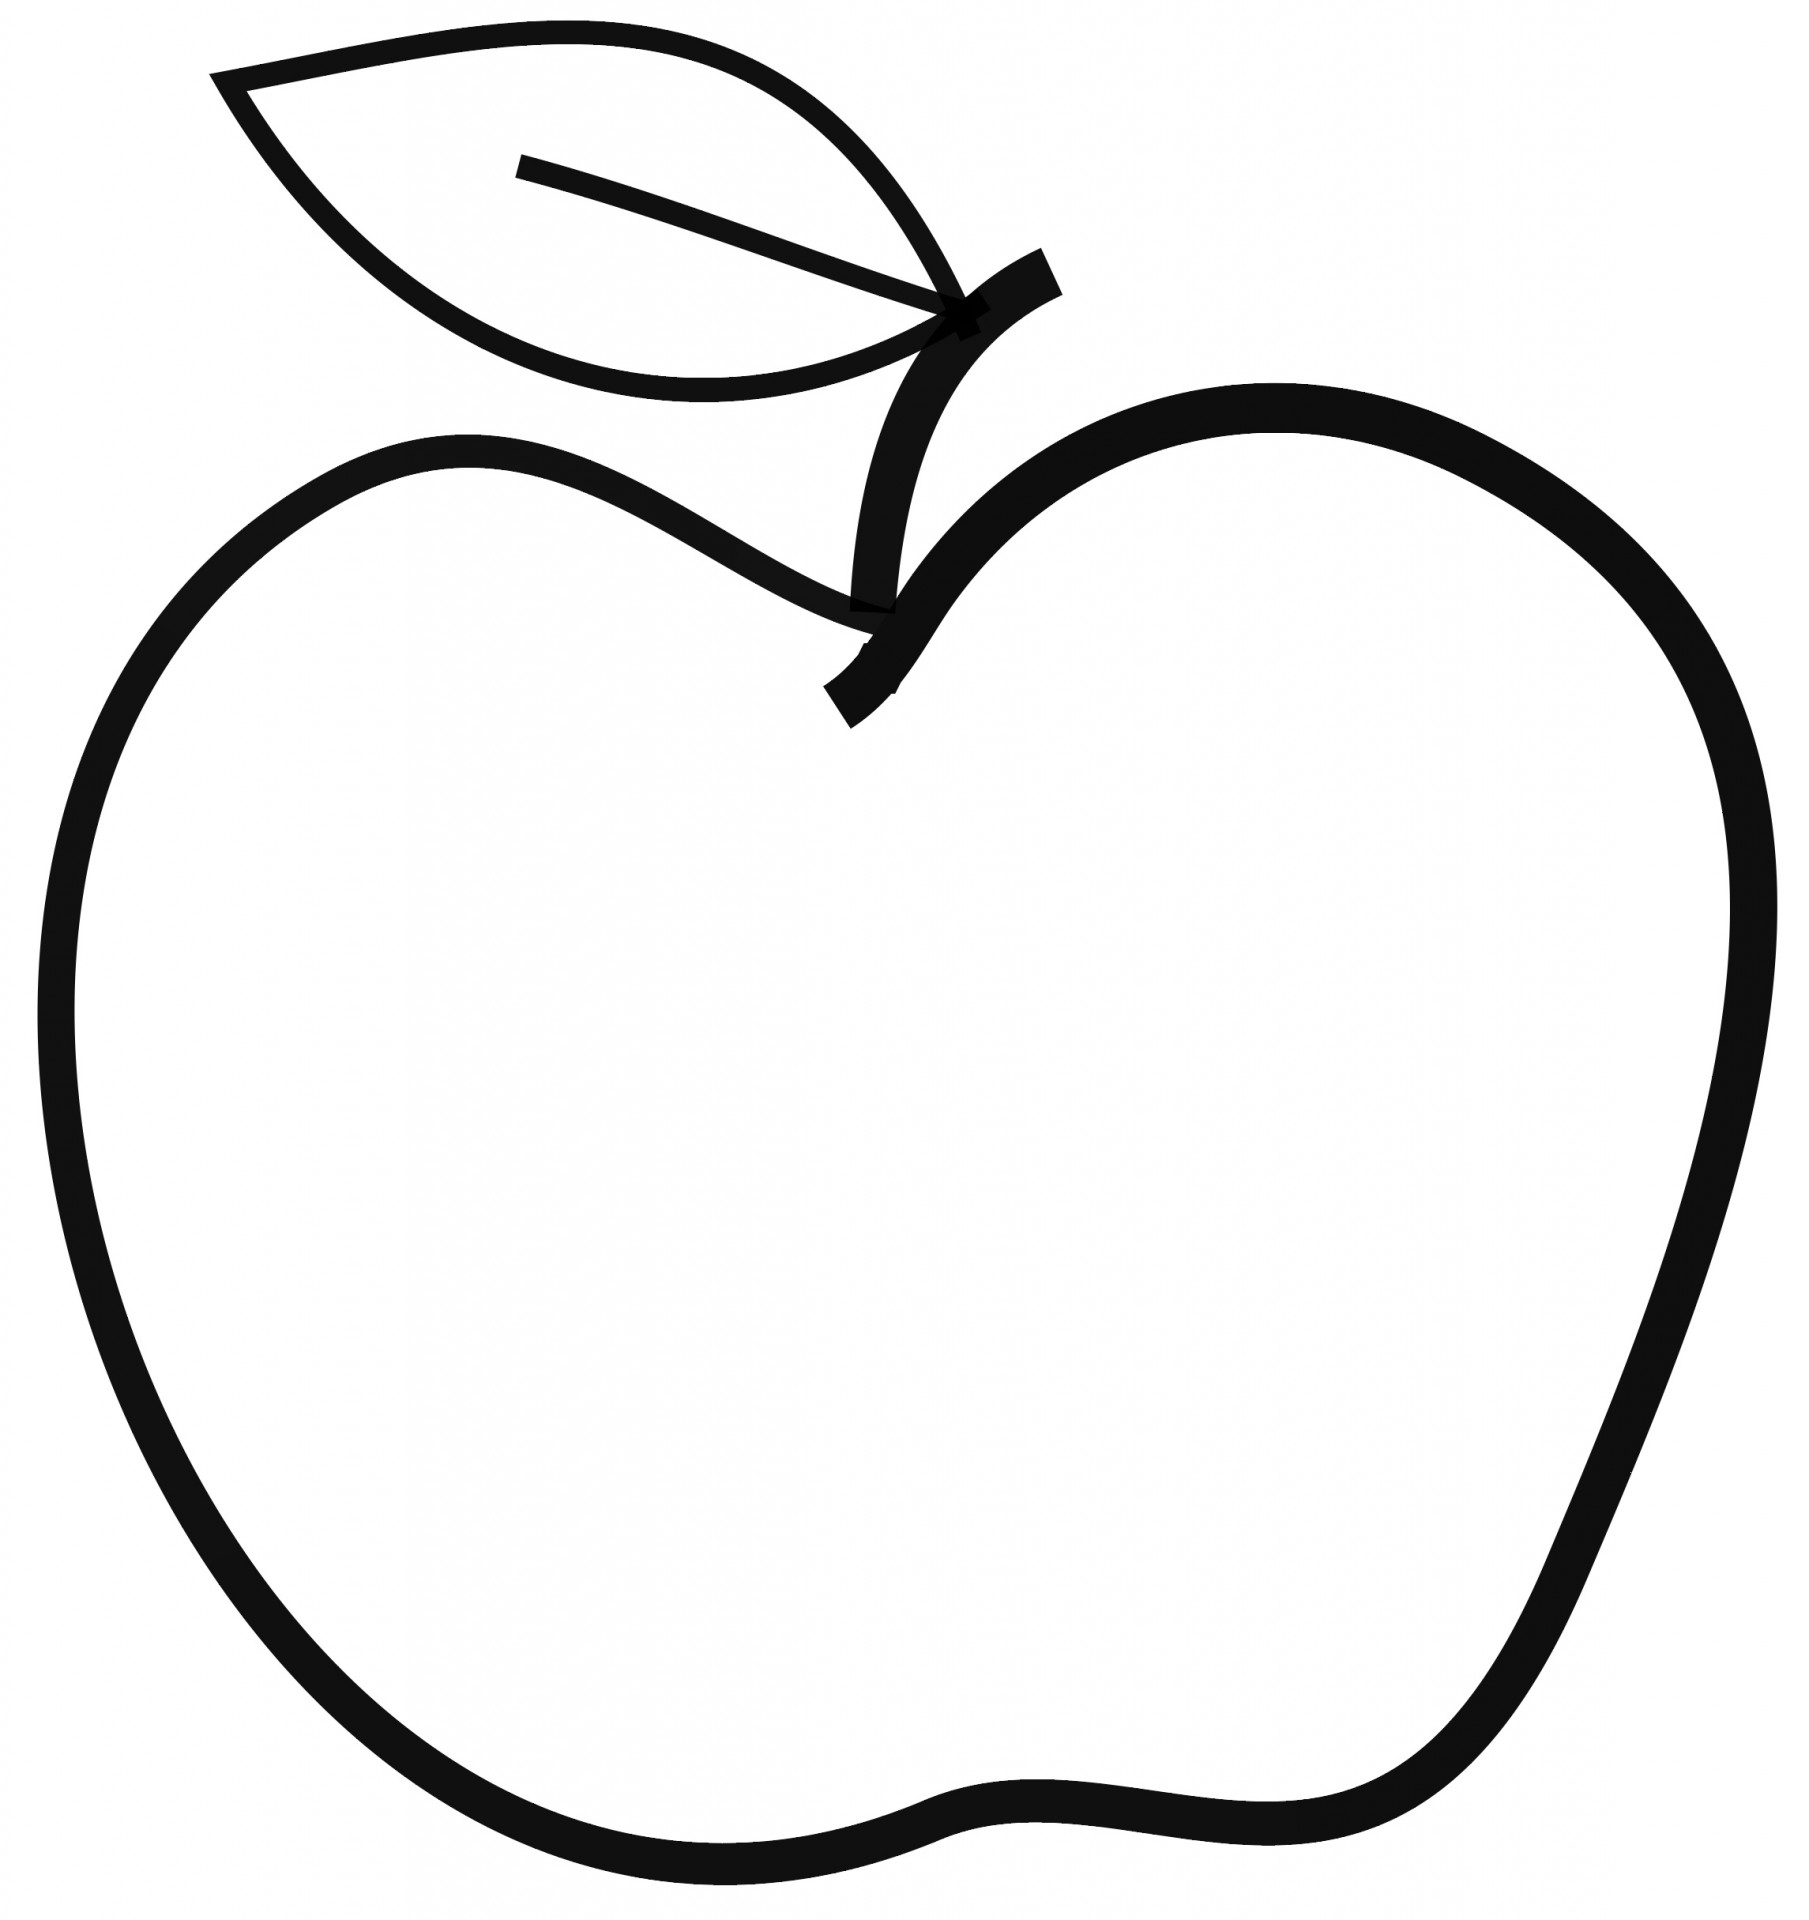 Apple apple clipart. Clip art free stock